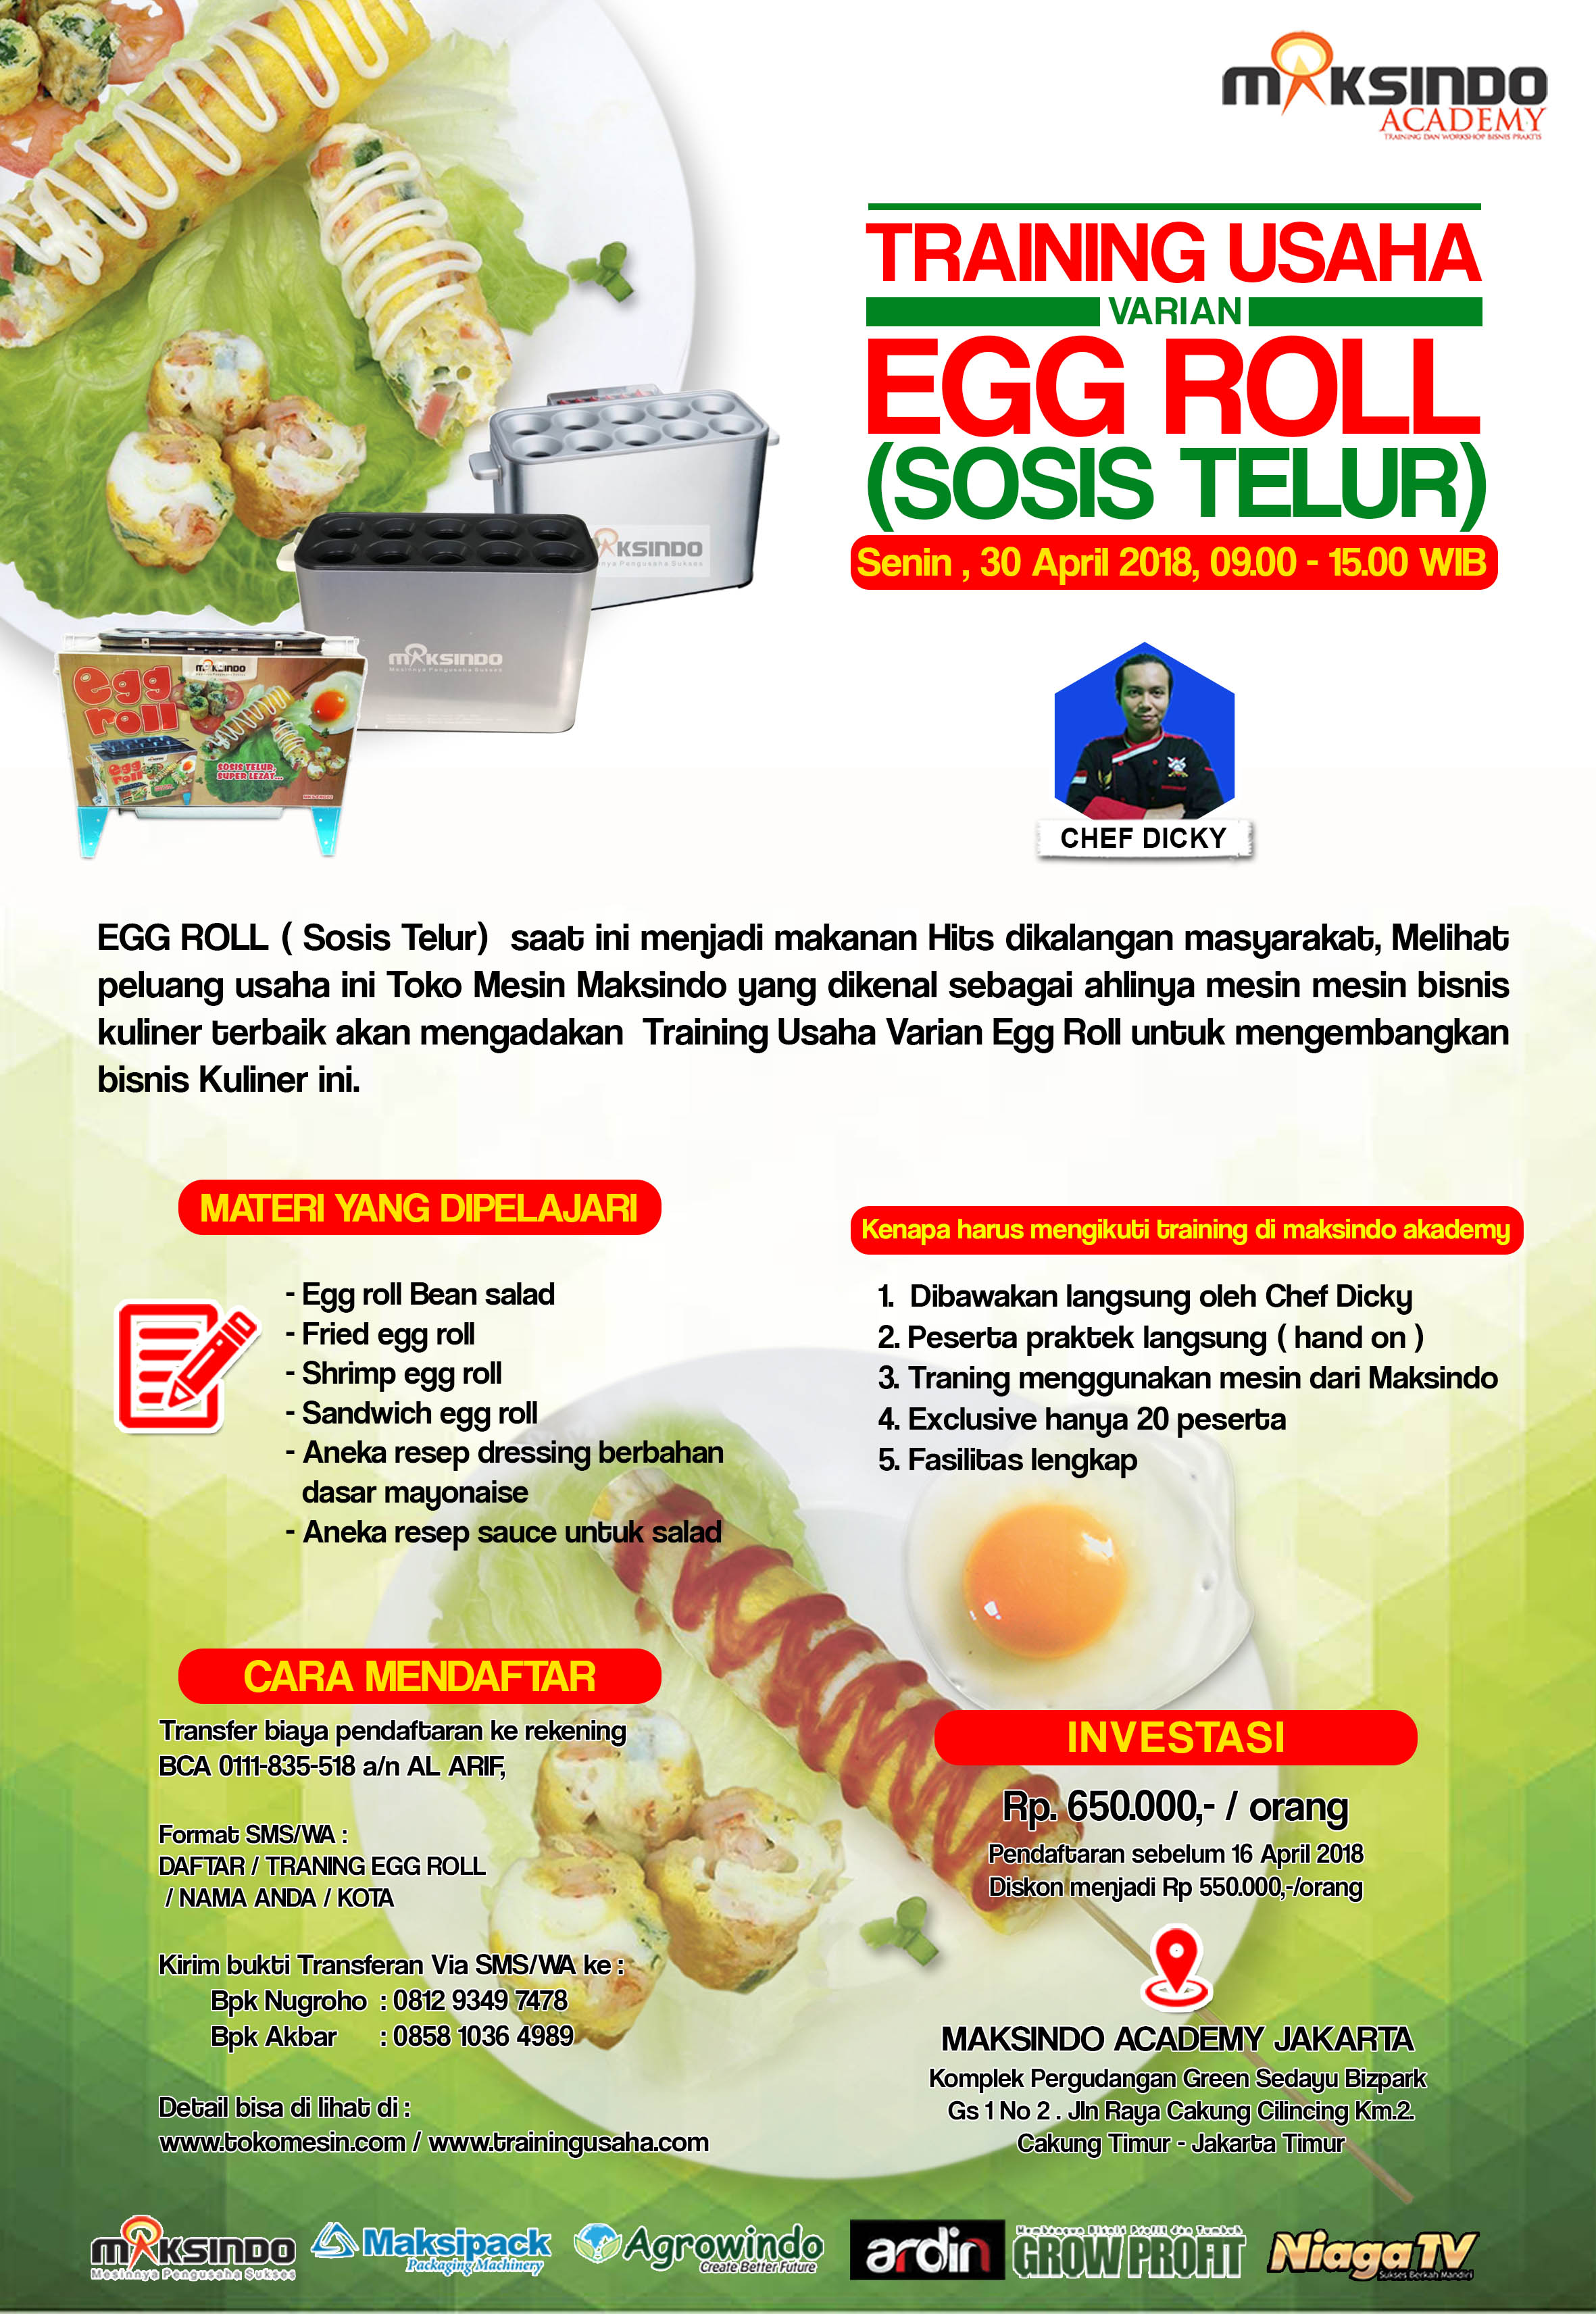 brousur tarining egg roll